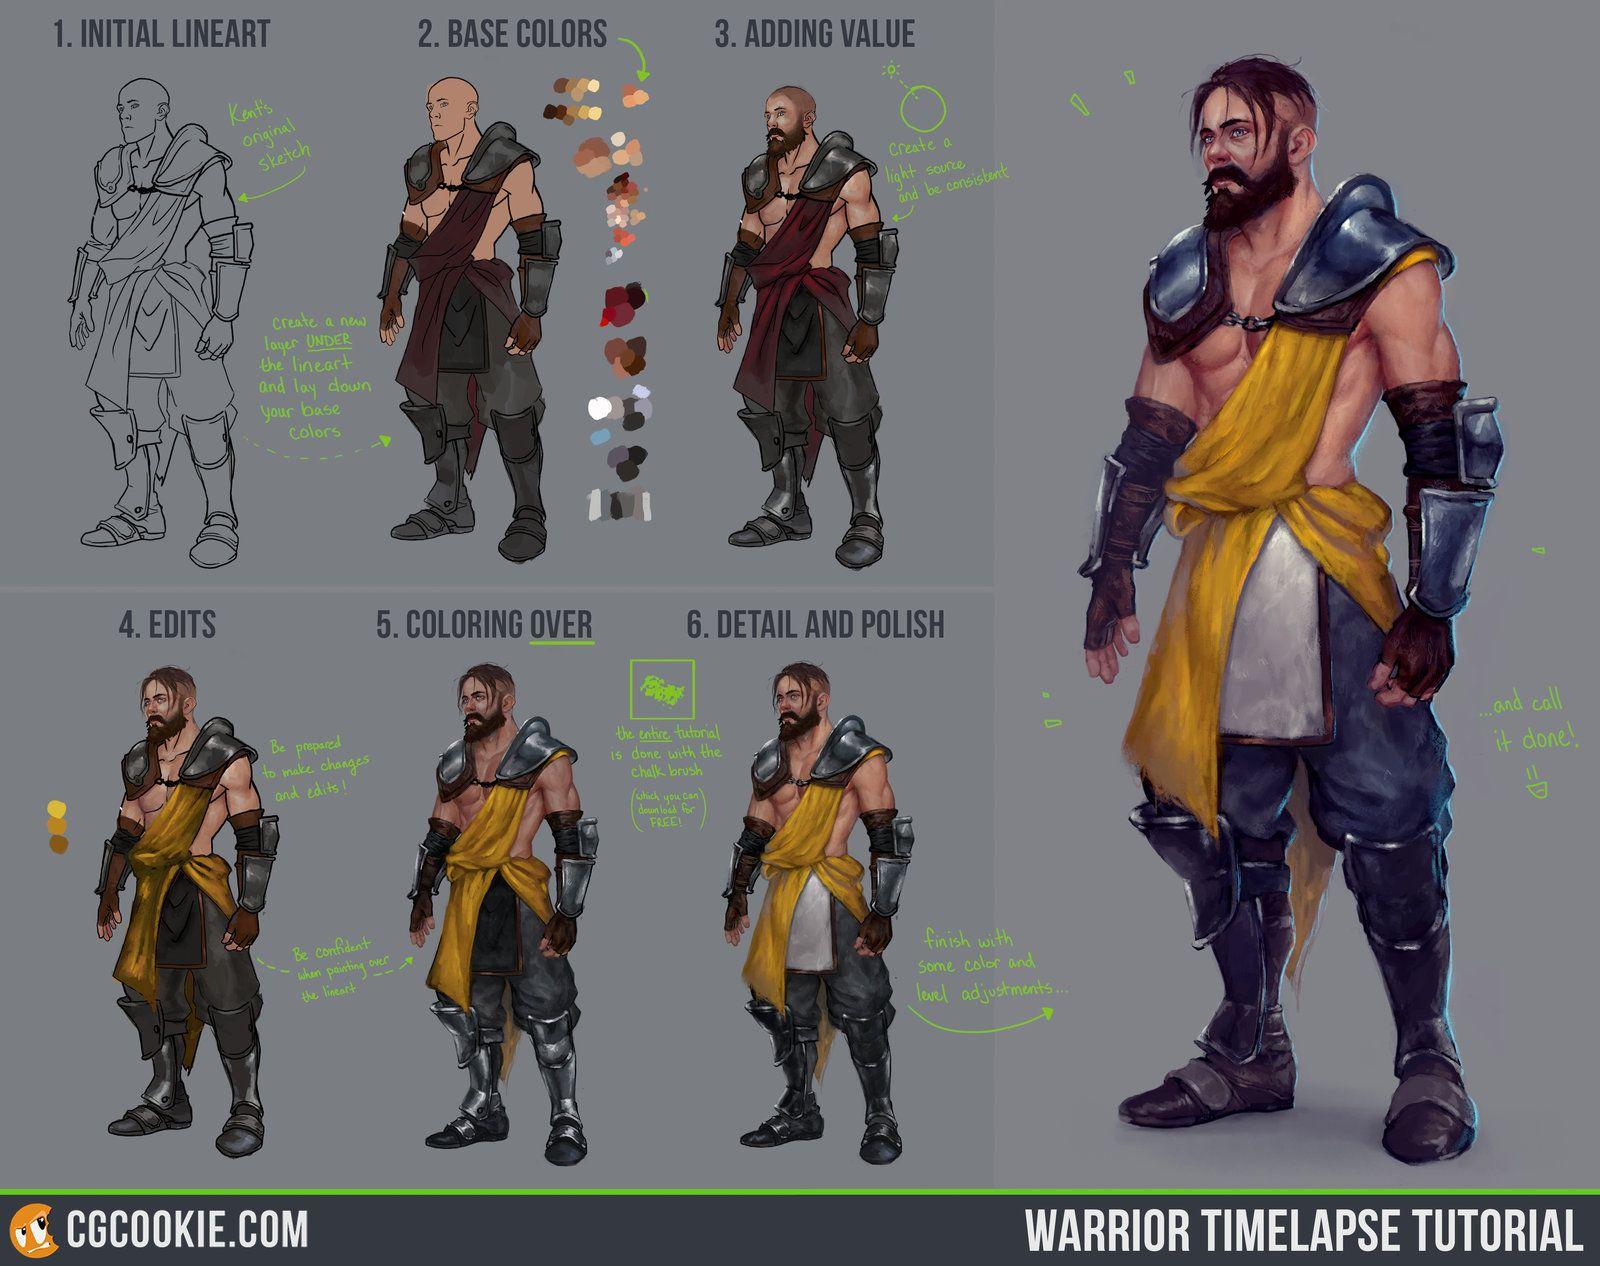 Character Design Tutorial Step By Step : Warrior timelapse tutorial step by cgcookie